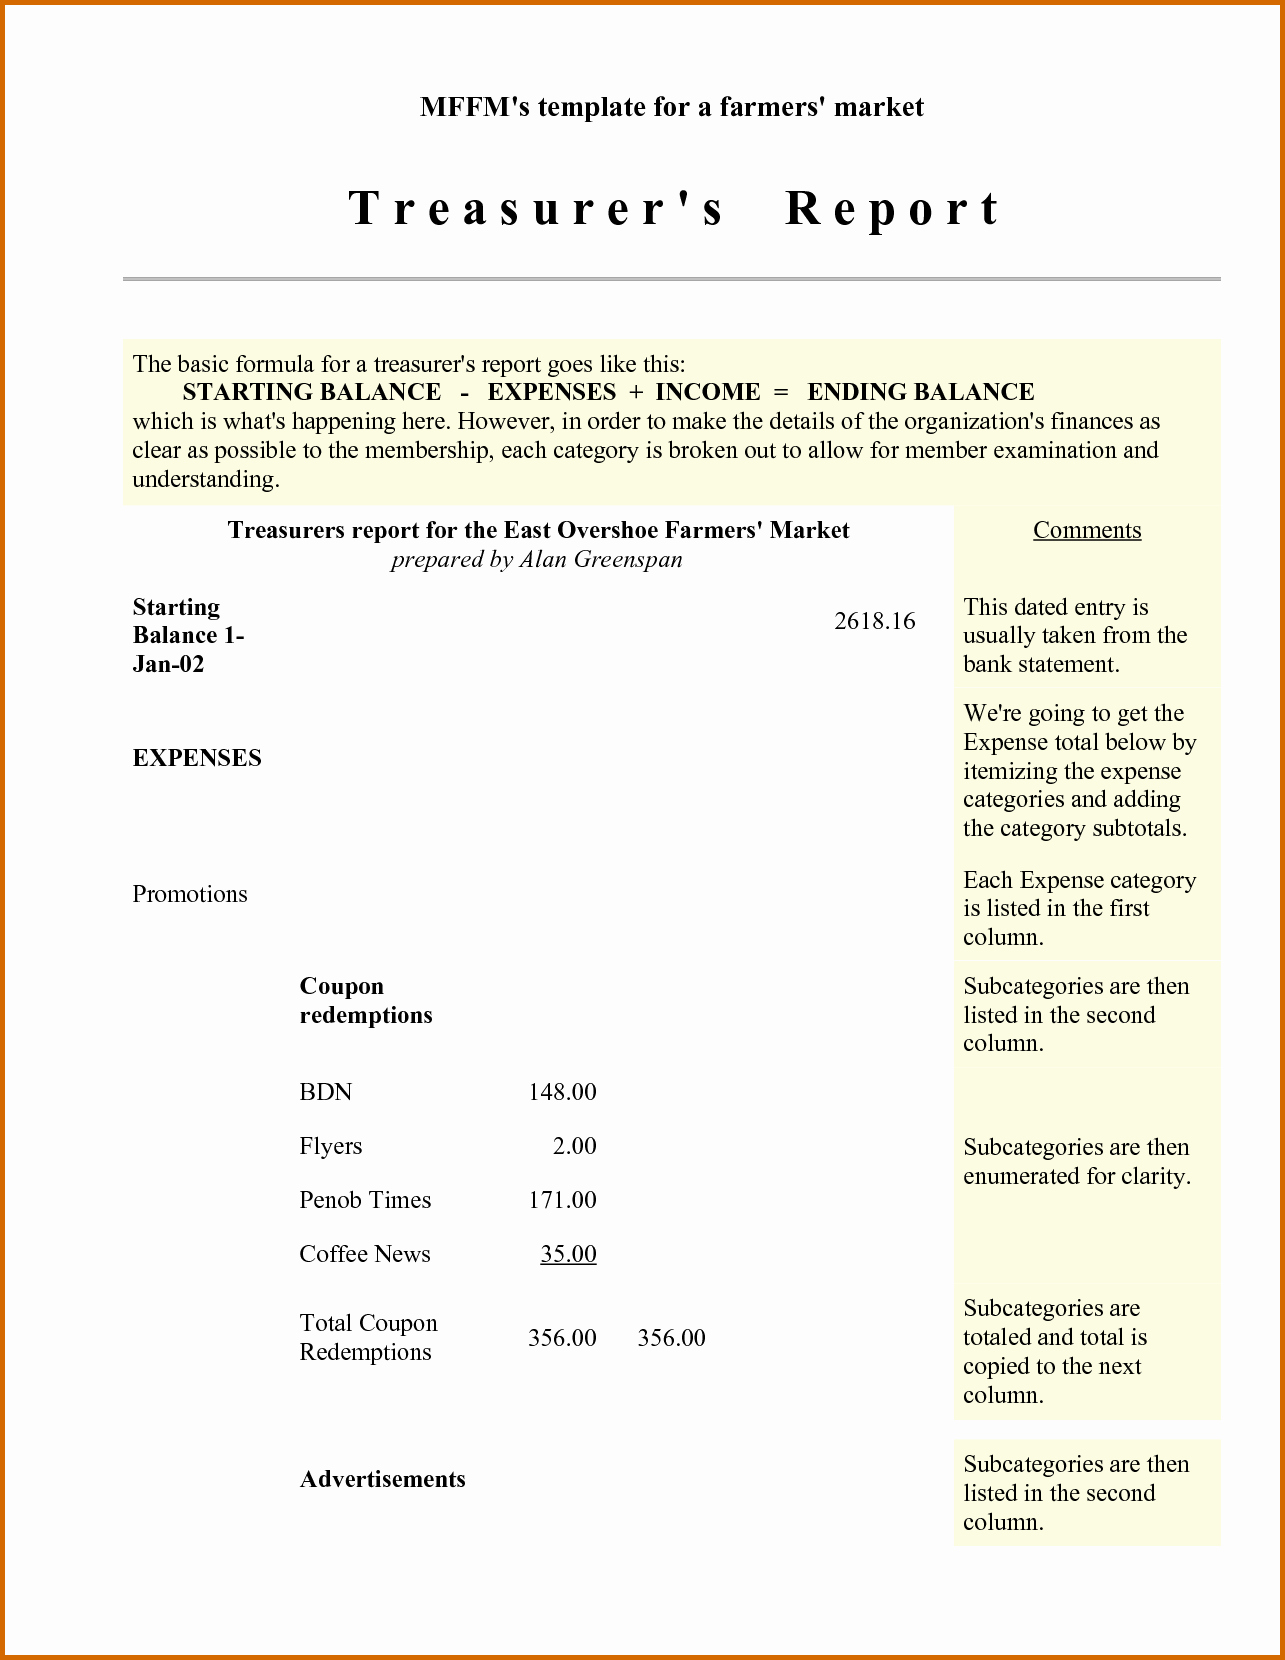 Treasurer Report Template Non Profit Unique 12 Sample Treasurer's Report for Non Profit